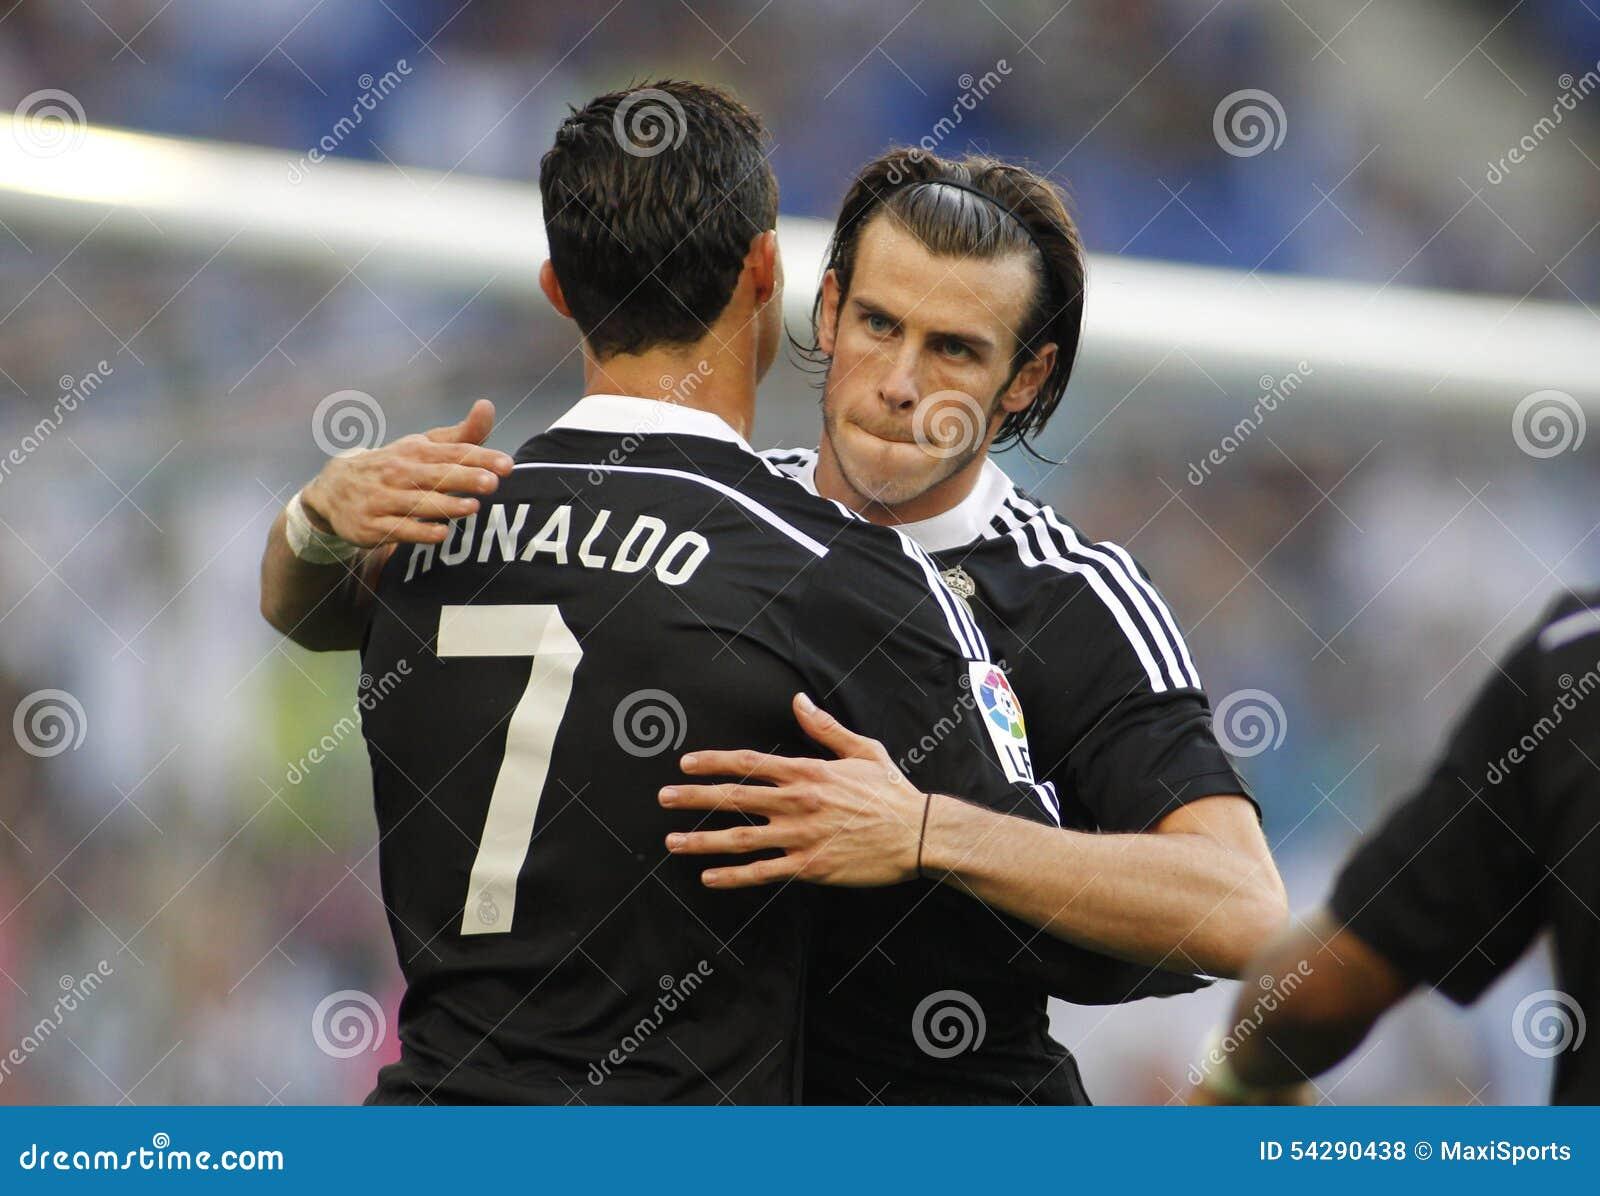 Cristiano Ronaldo und Gareth Bale von Real Madrid